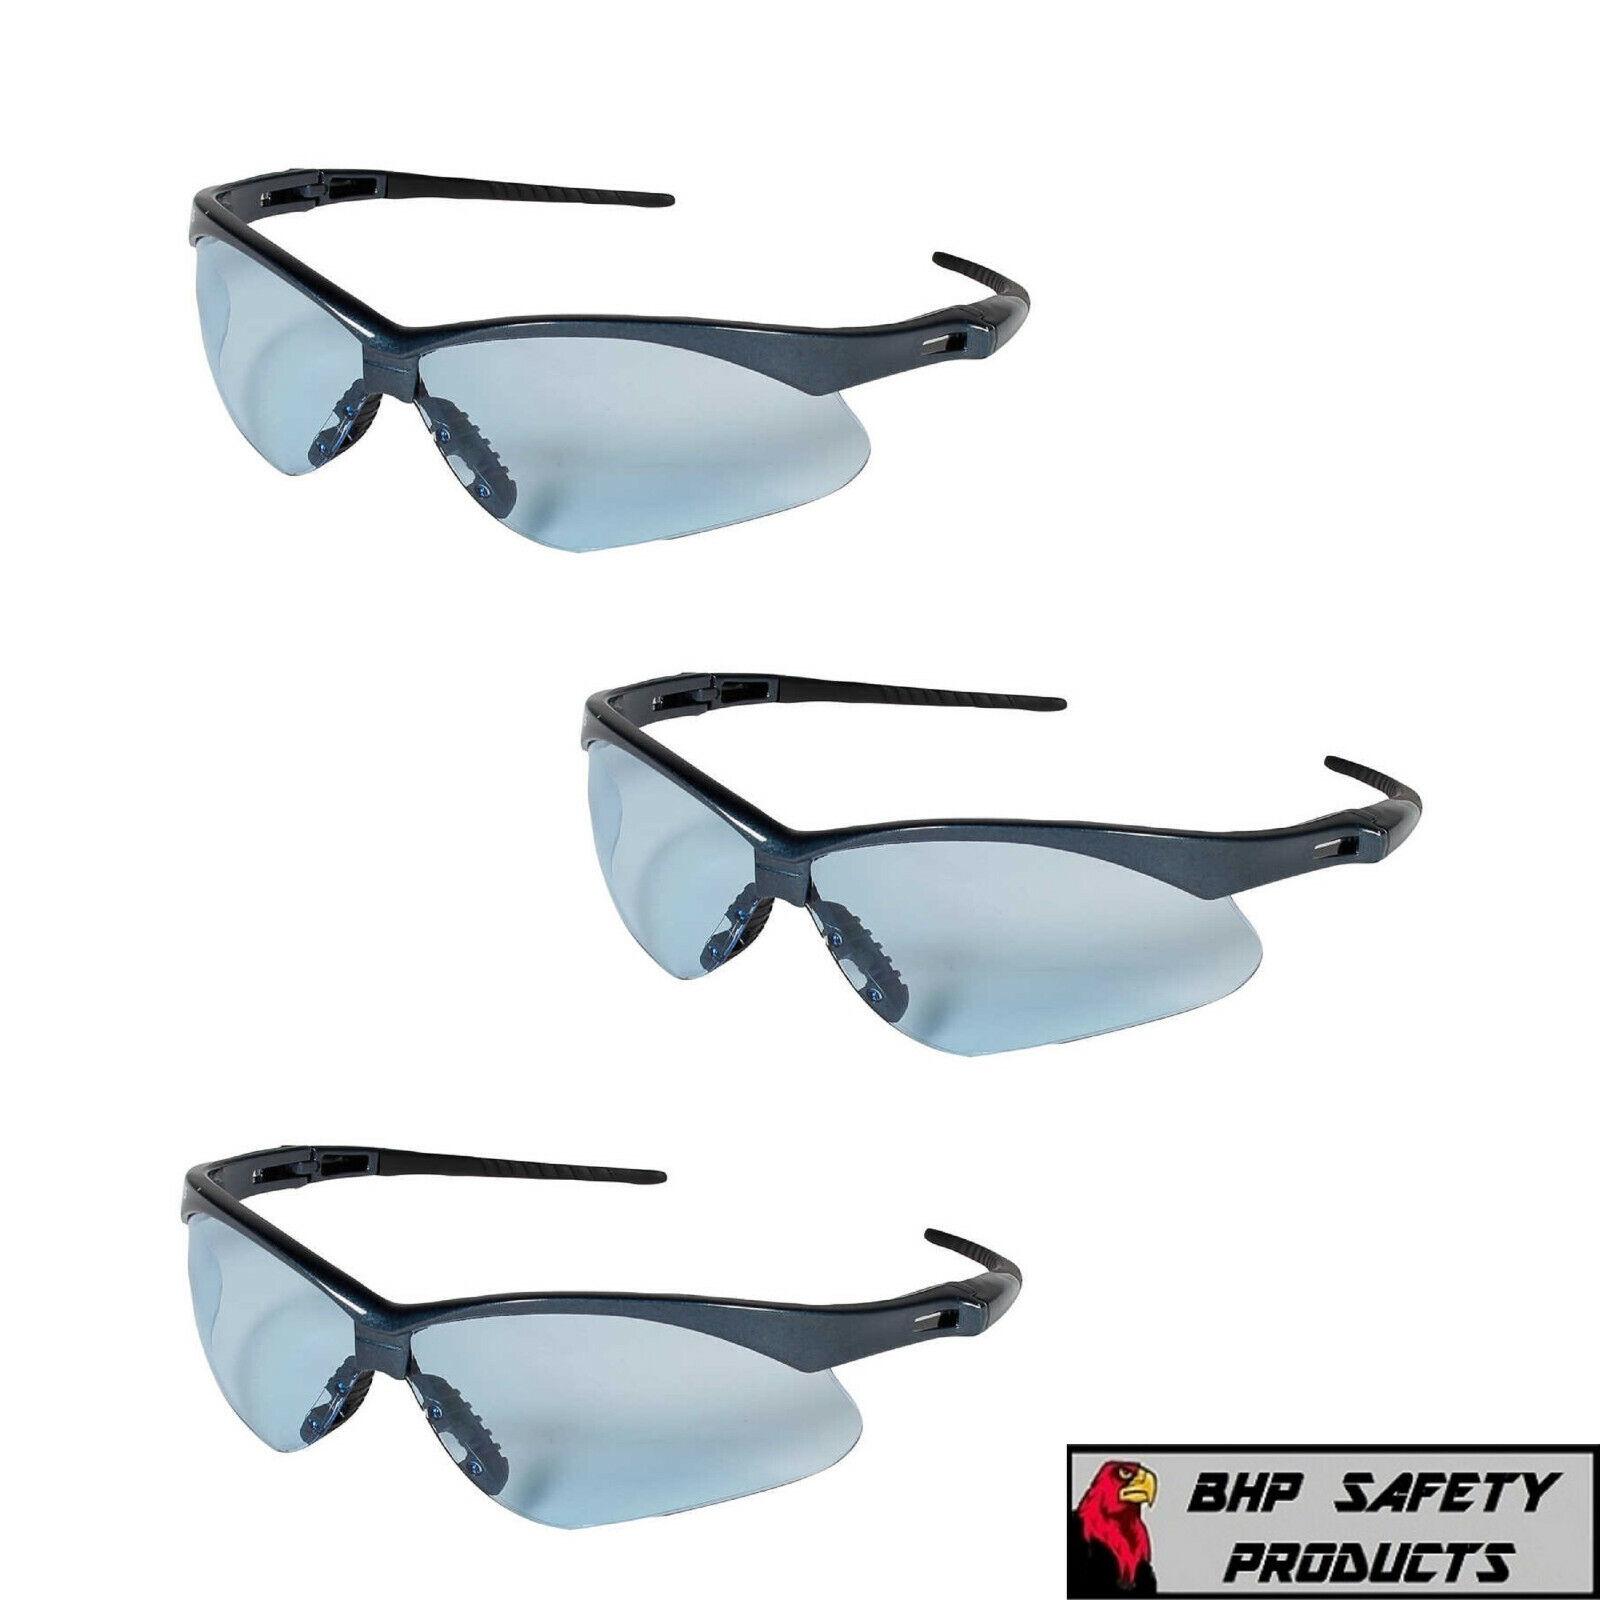 3 pair jackson nemesis safety glasses light